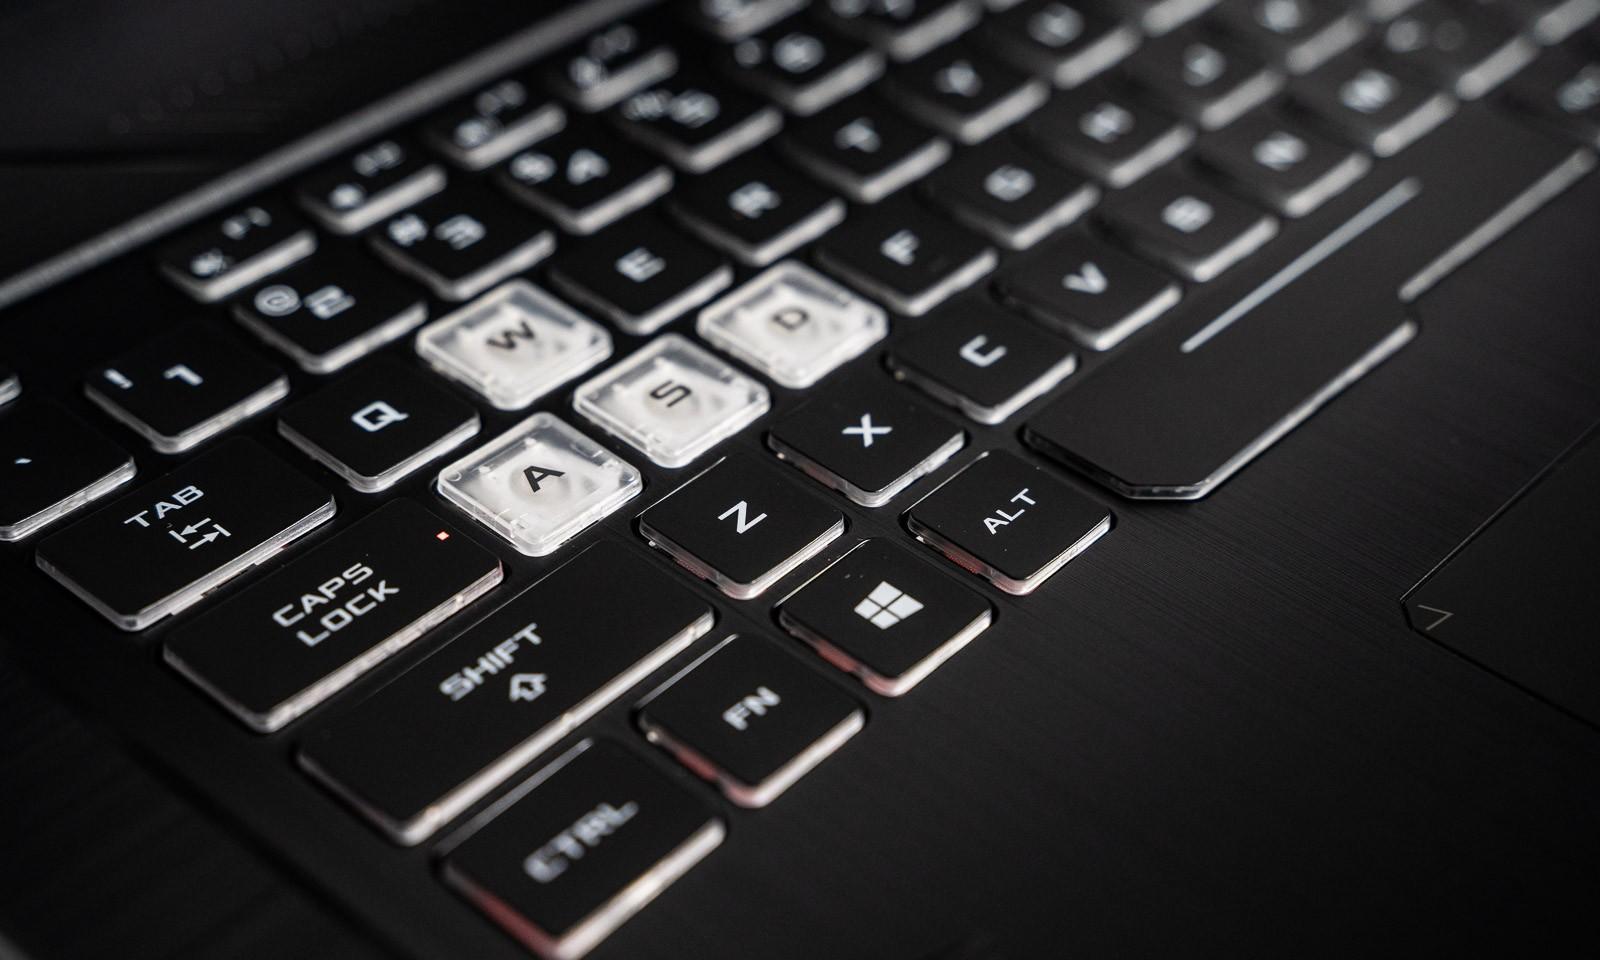 Tastele WASD sunt transparente pe tastatura lui TUF Gaming FX705DU